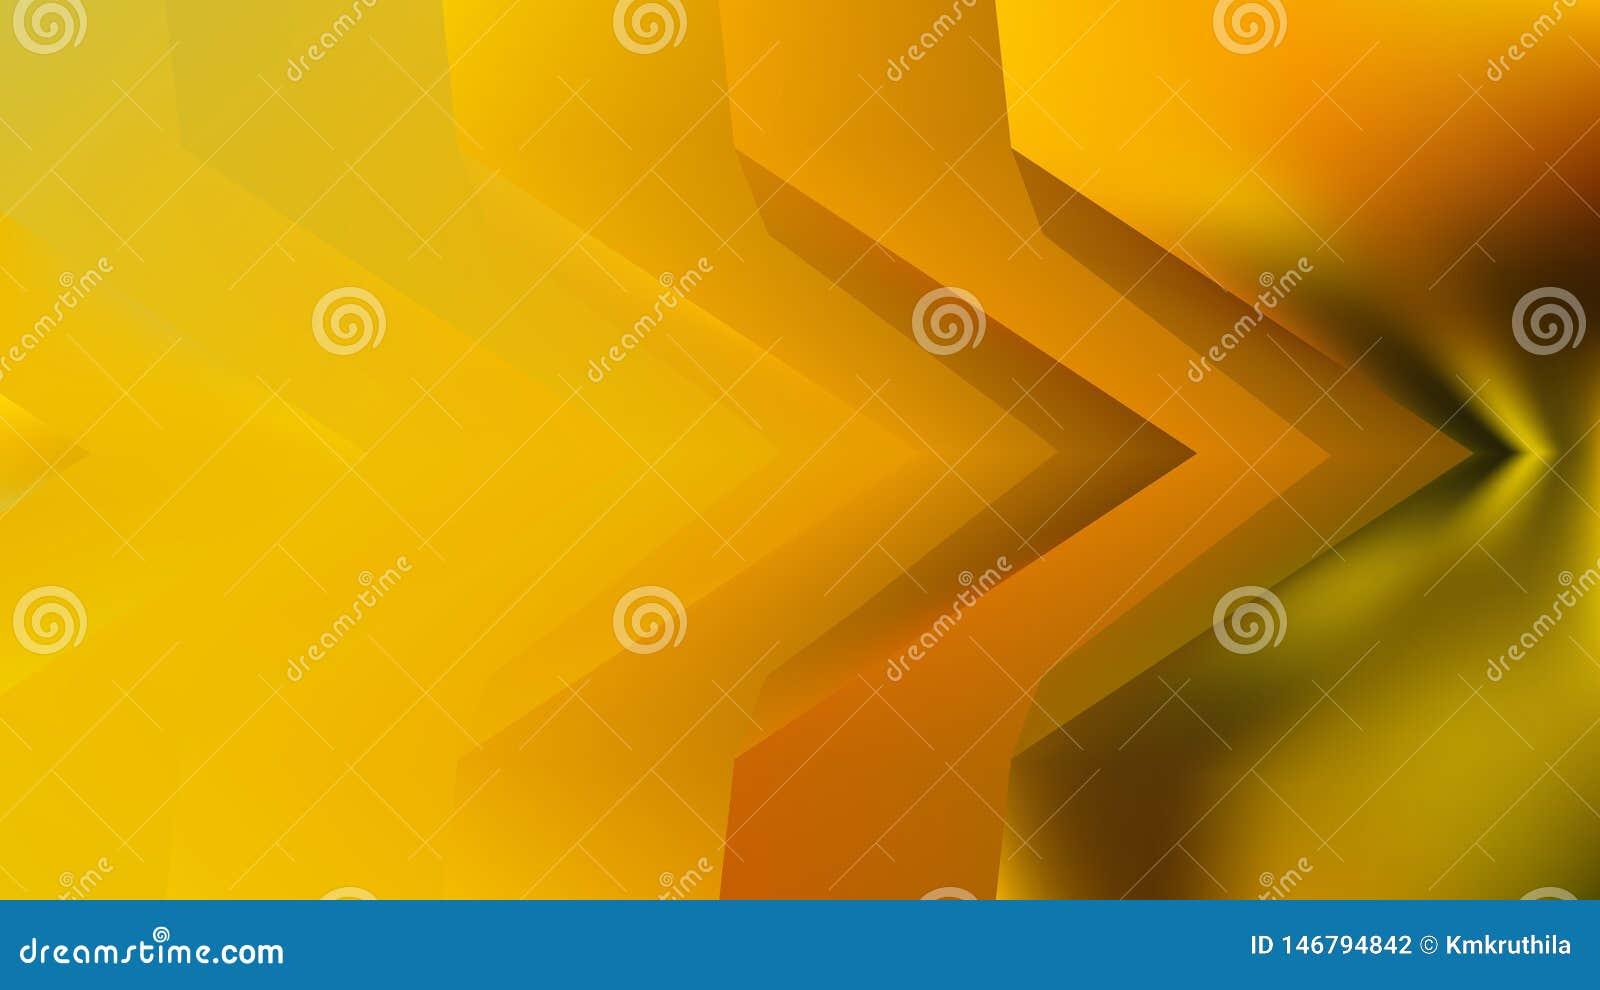 Yellow Orange Green Background Beautiful elegant Illustration graphic art design Background